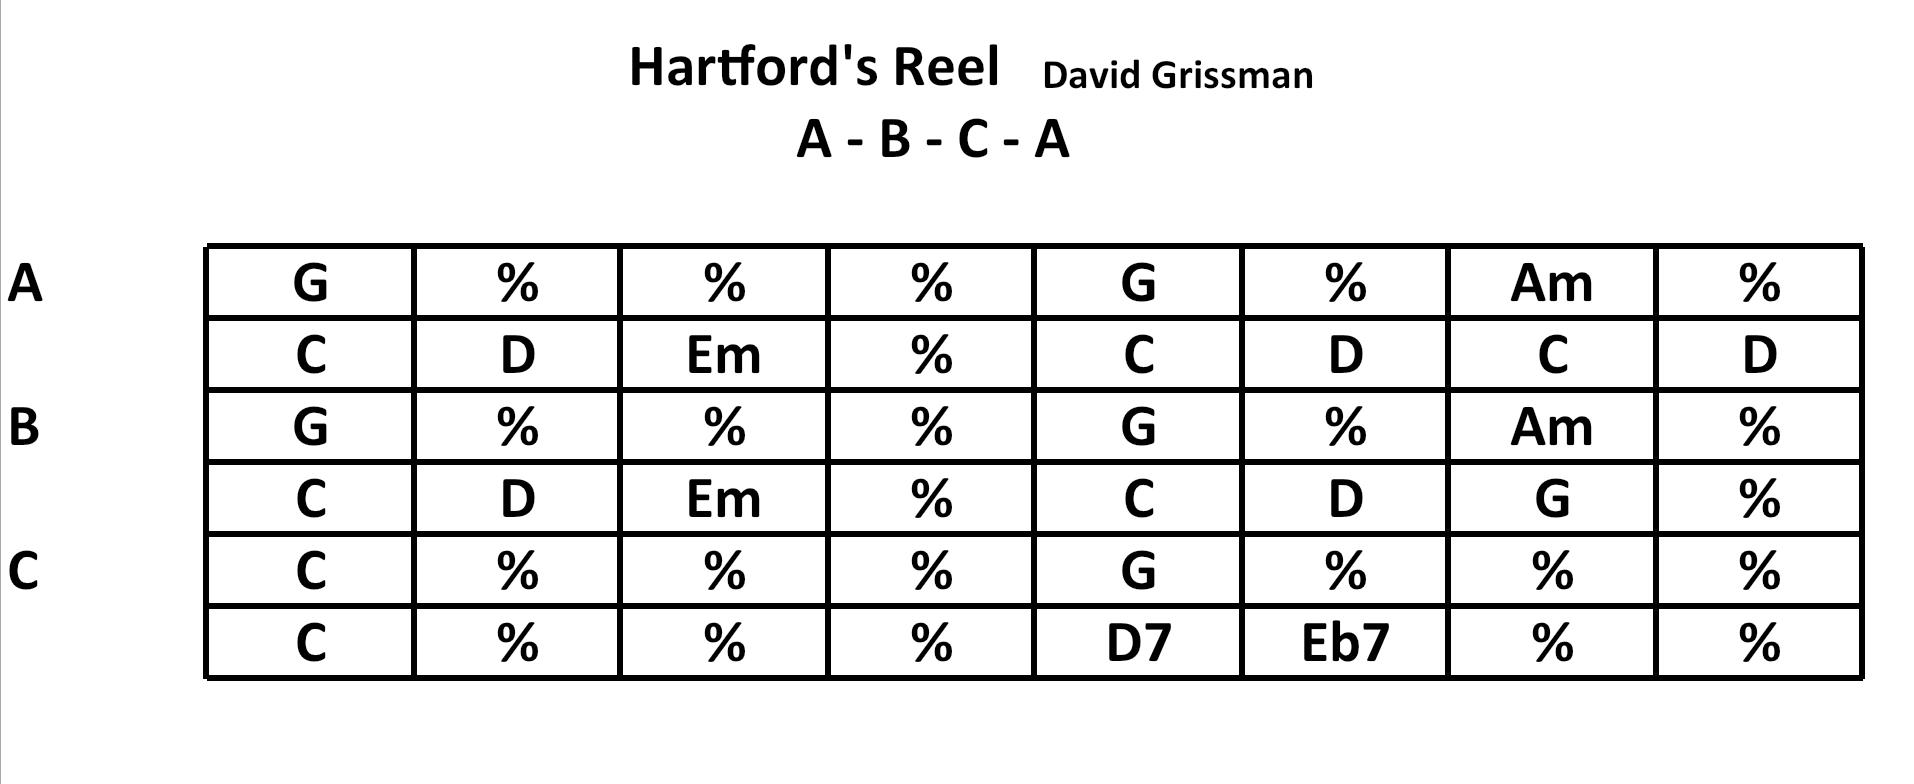 Hartford's Reel